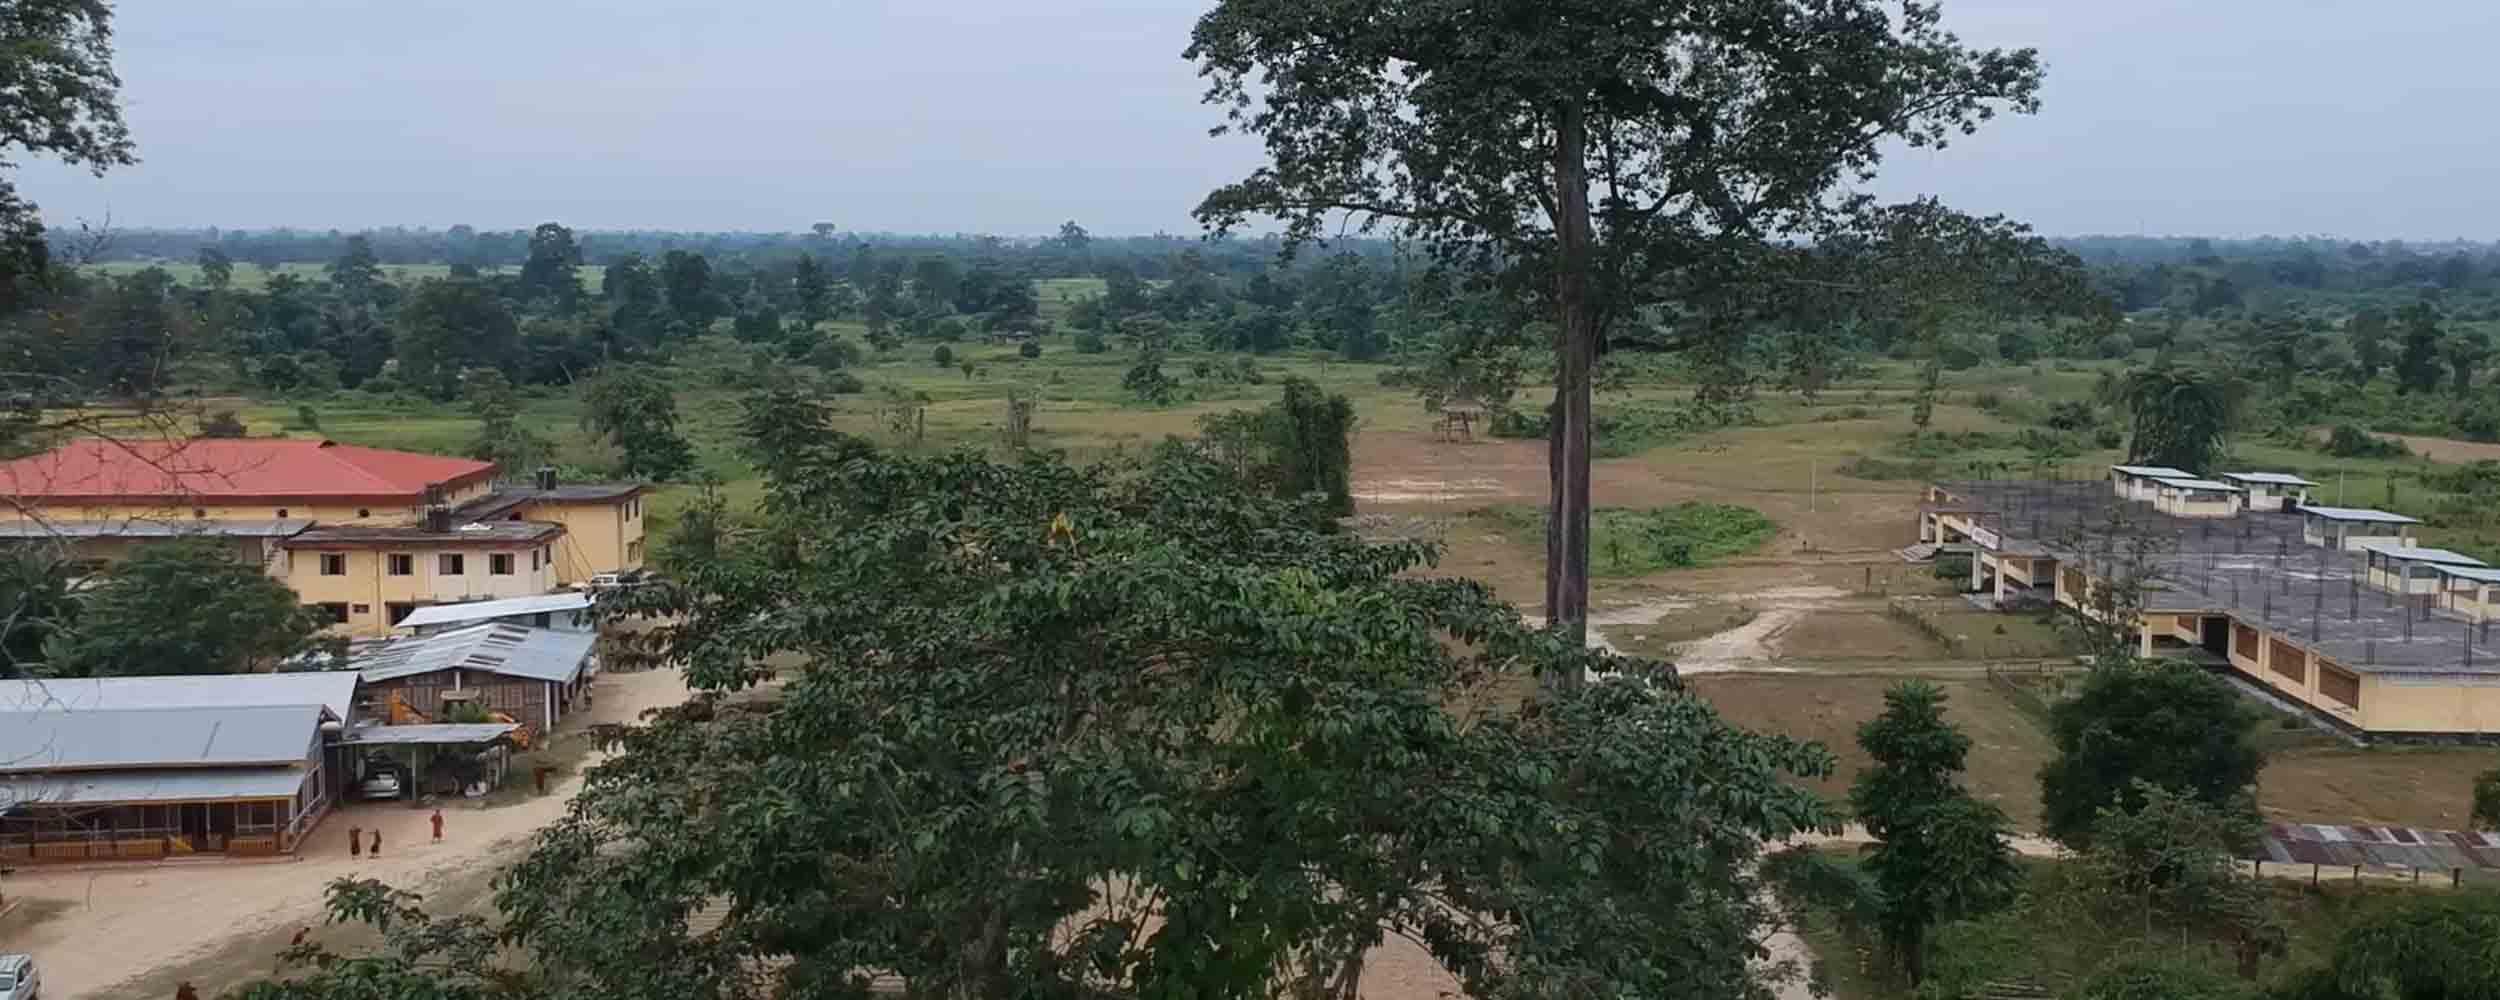 namsai-mahabodhi-area